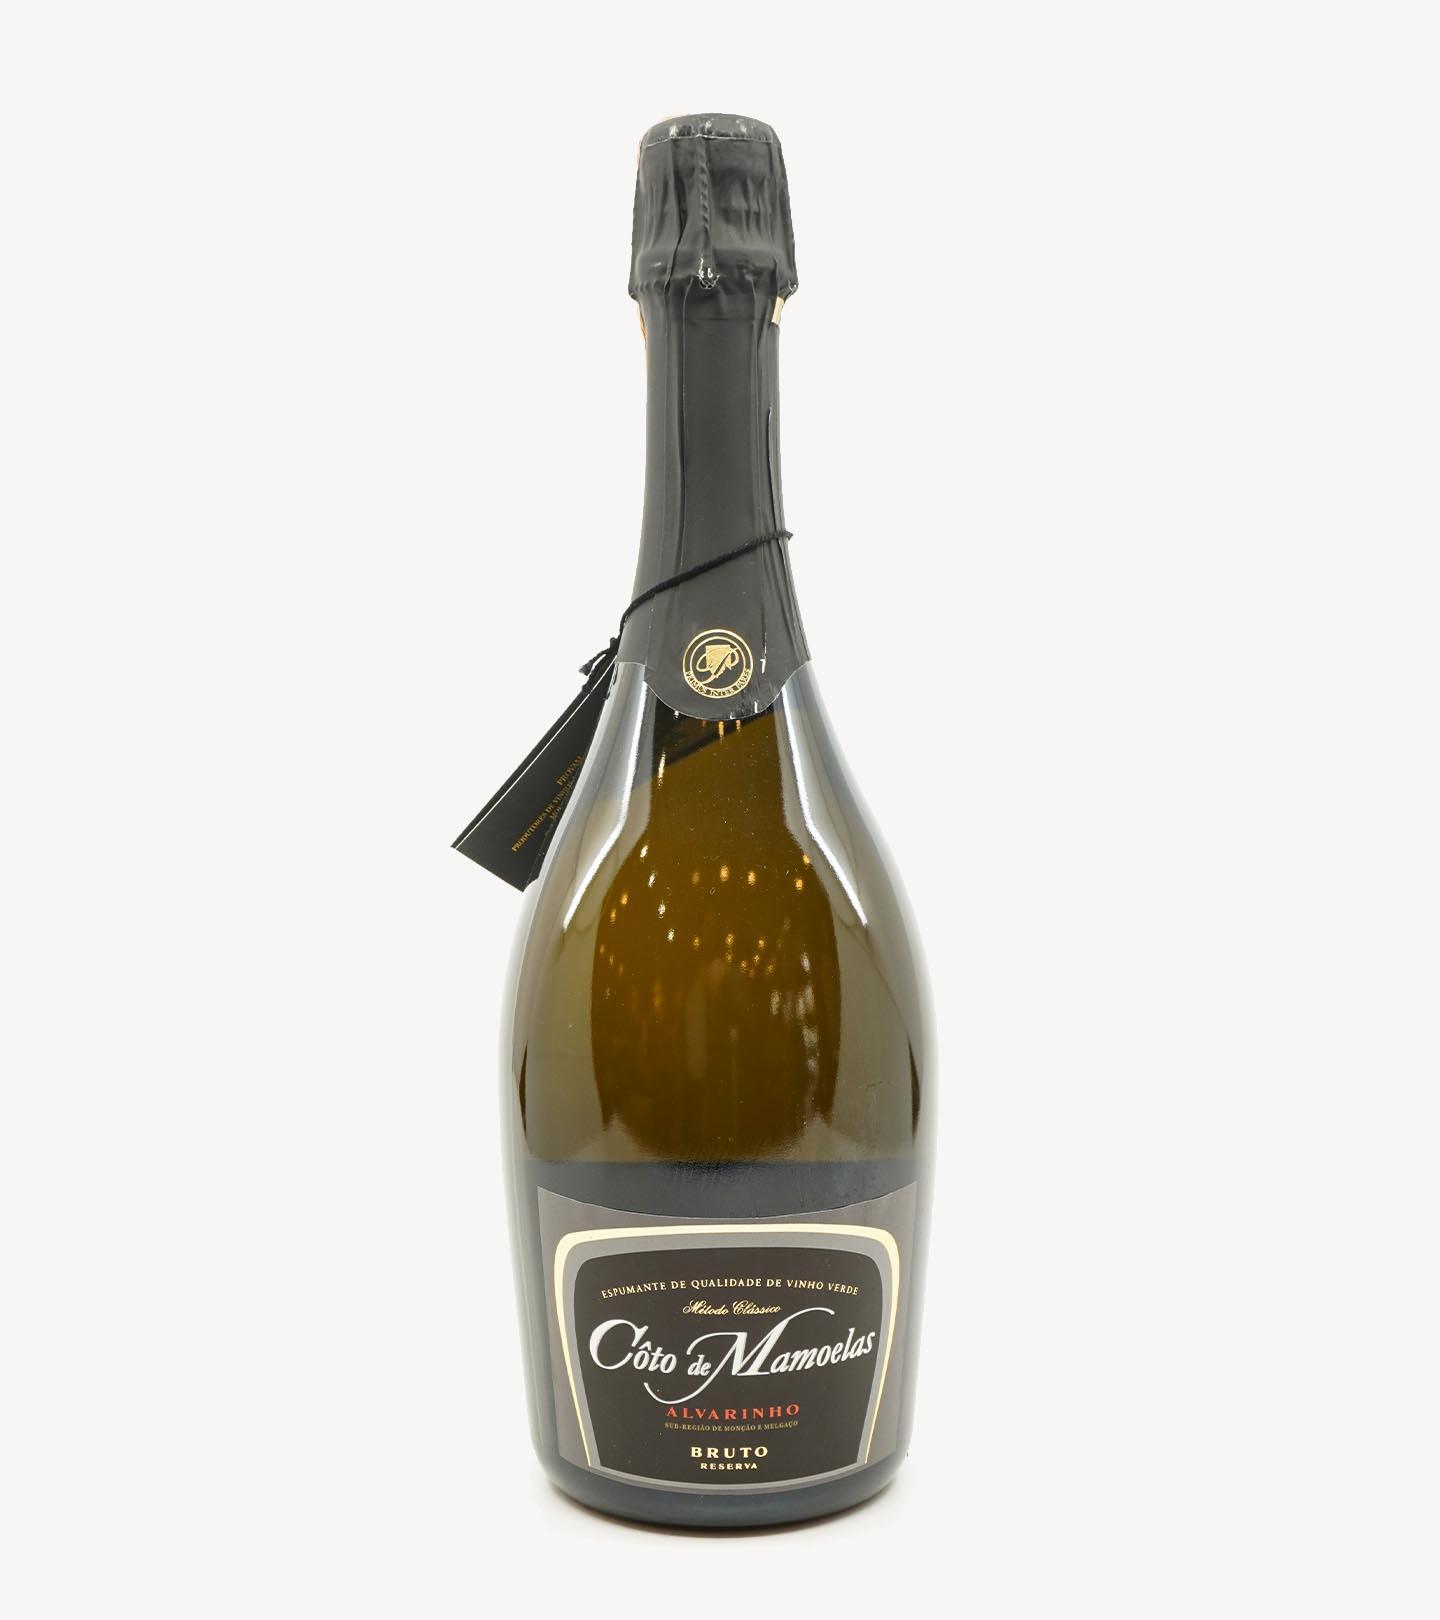 Espumante de Vinho Verde Alvarinho Reserva Bruto Côto de Mamoelas 75cl